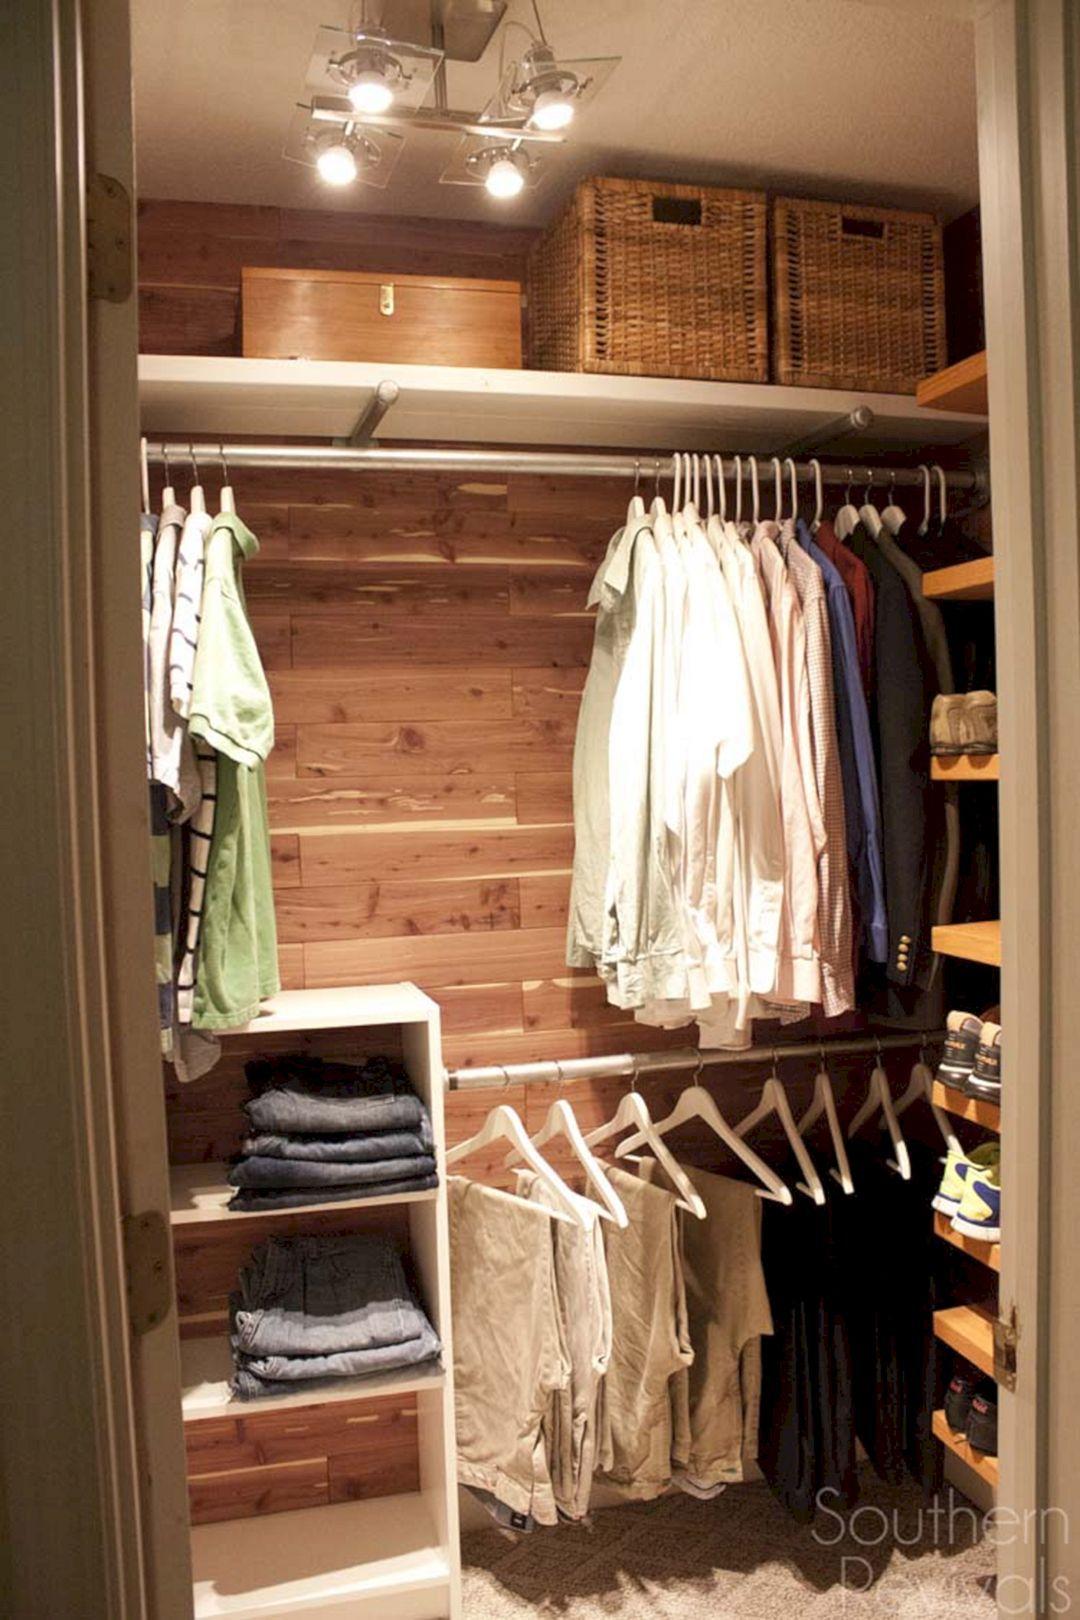 Merveilleux Closet Full Of Ericu0027s Old Clothing